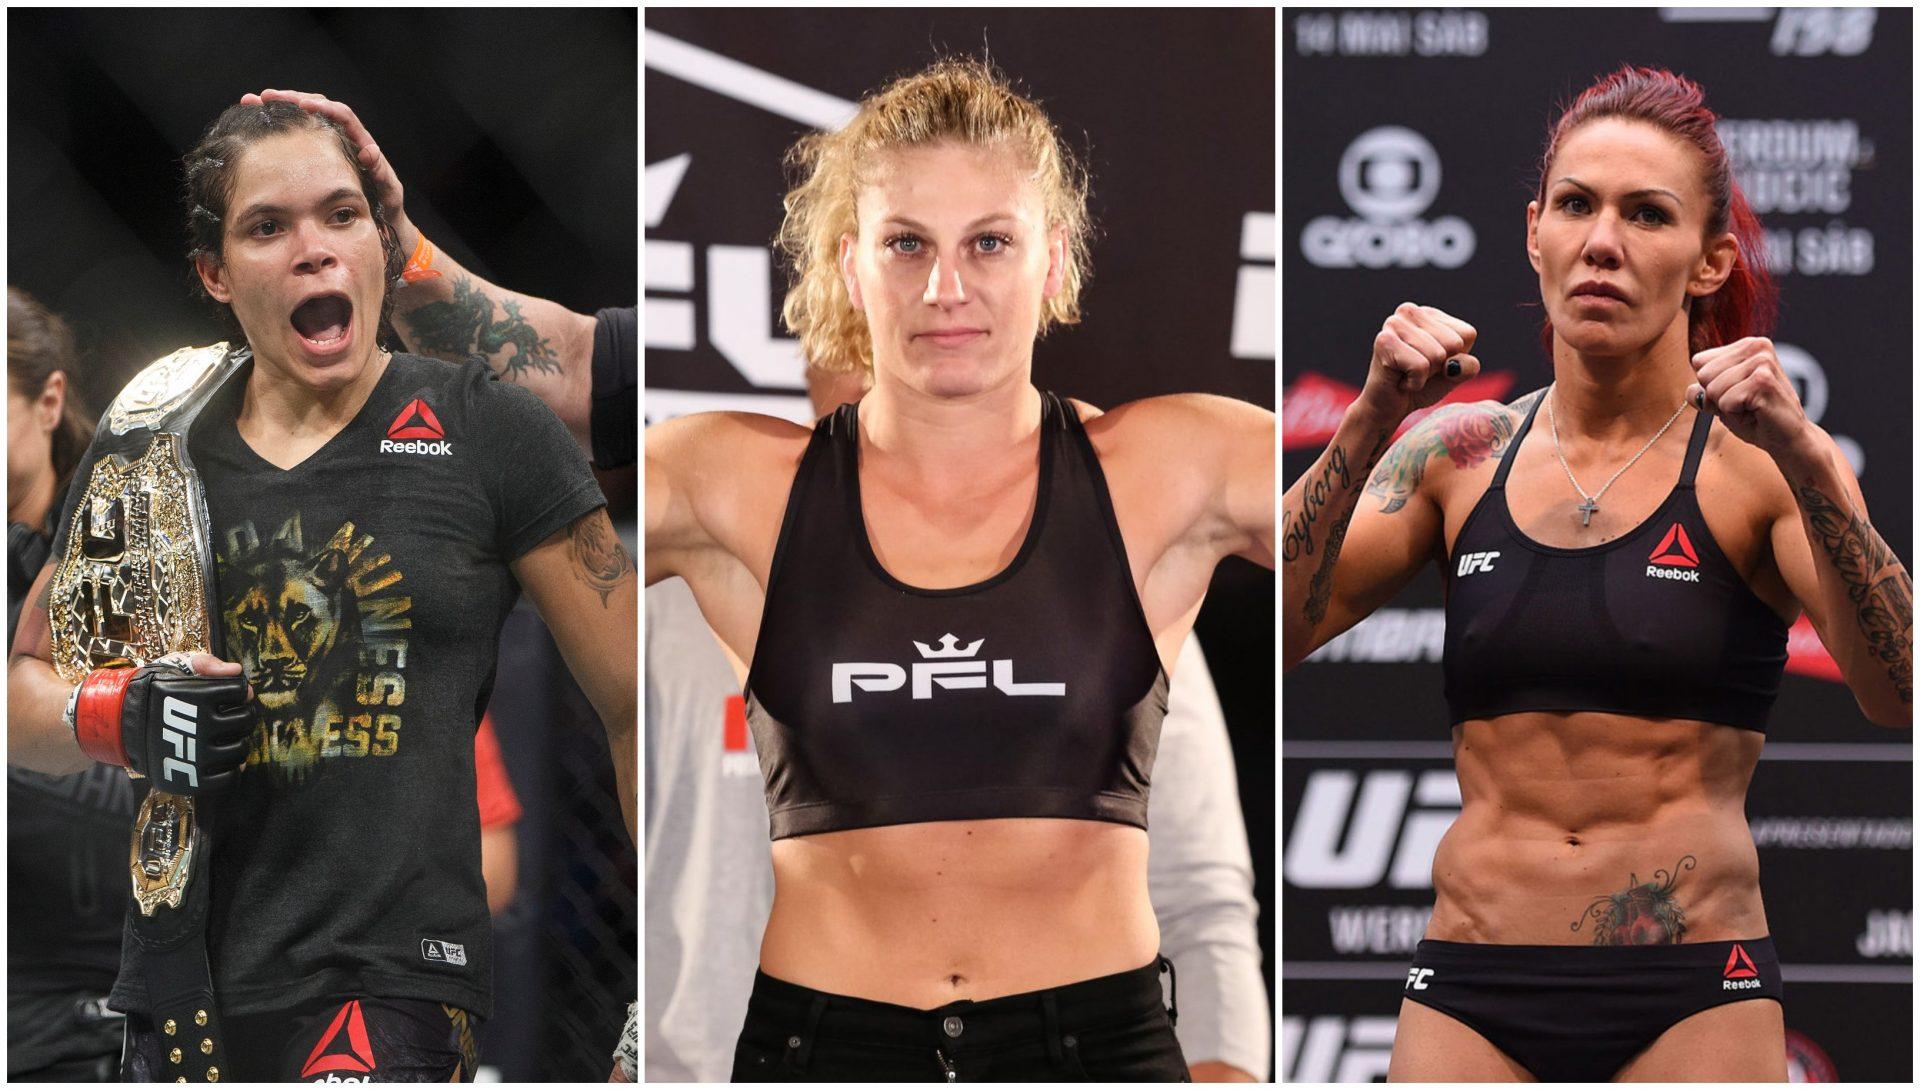 PFL Champion Kayla Harrison open to fighting Amanda Nunes and Chris Cyborg - Kayla Harrison